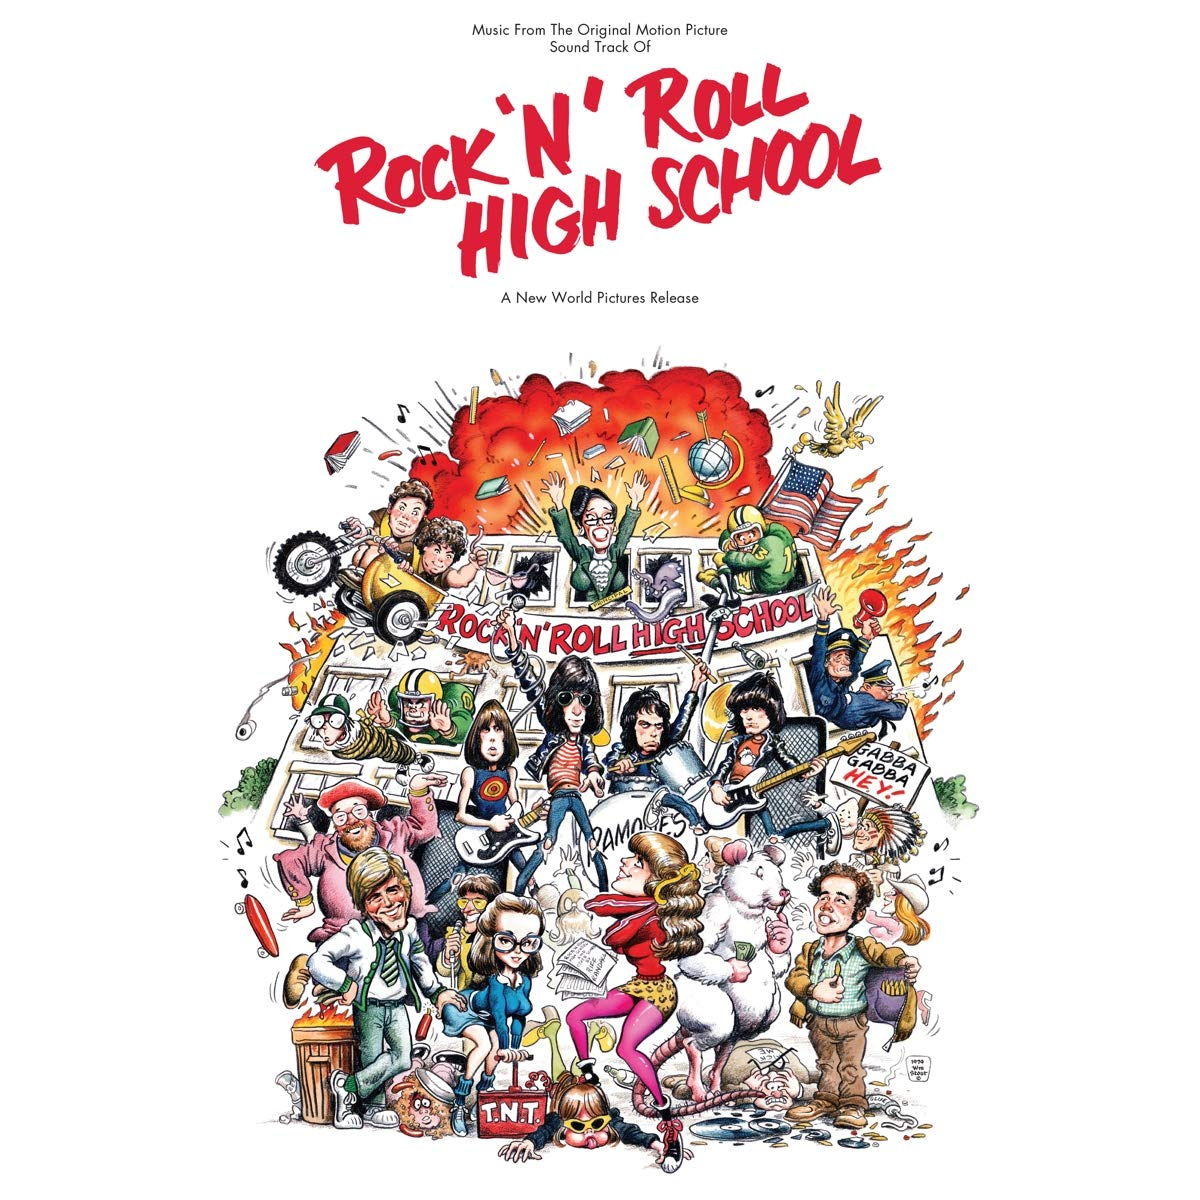 VA - Rock 'N' Roll High School (2001) [FLAC] Download